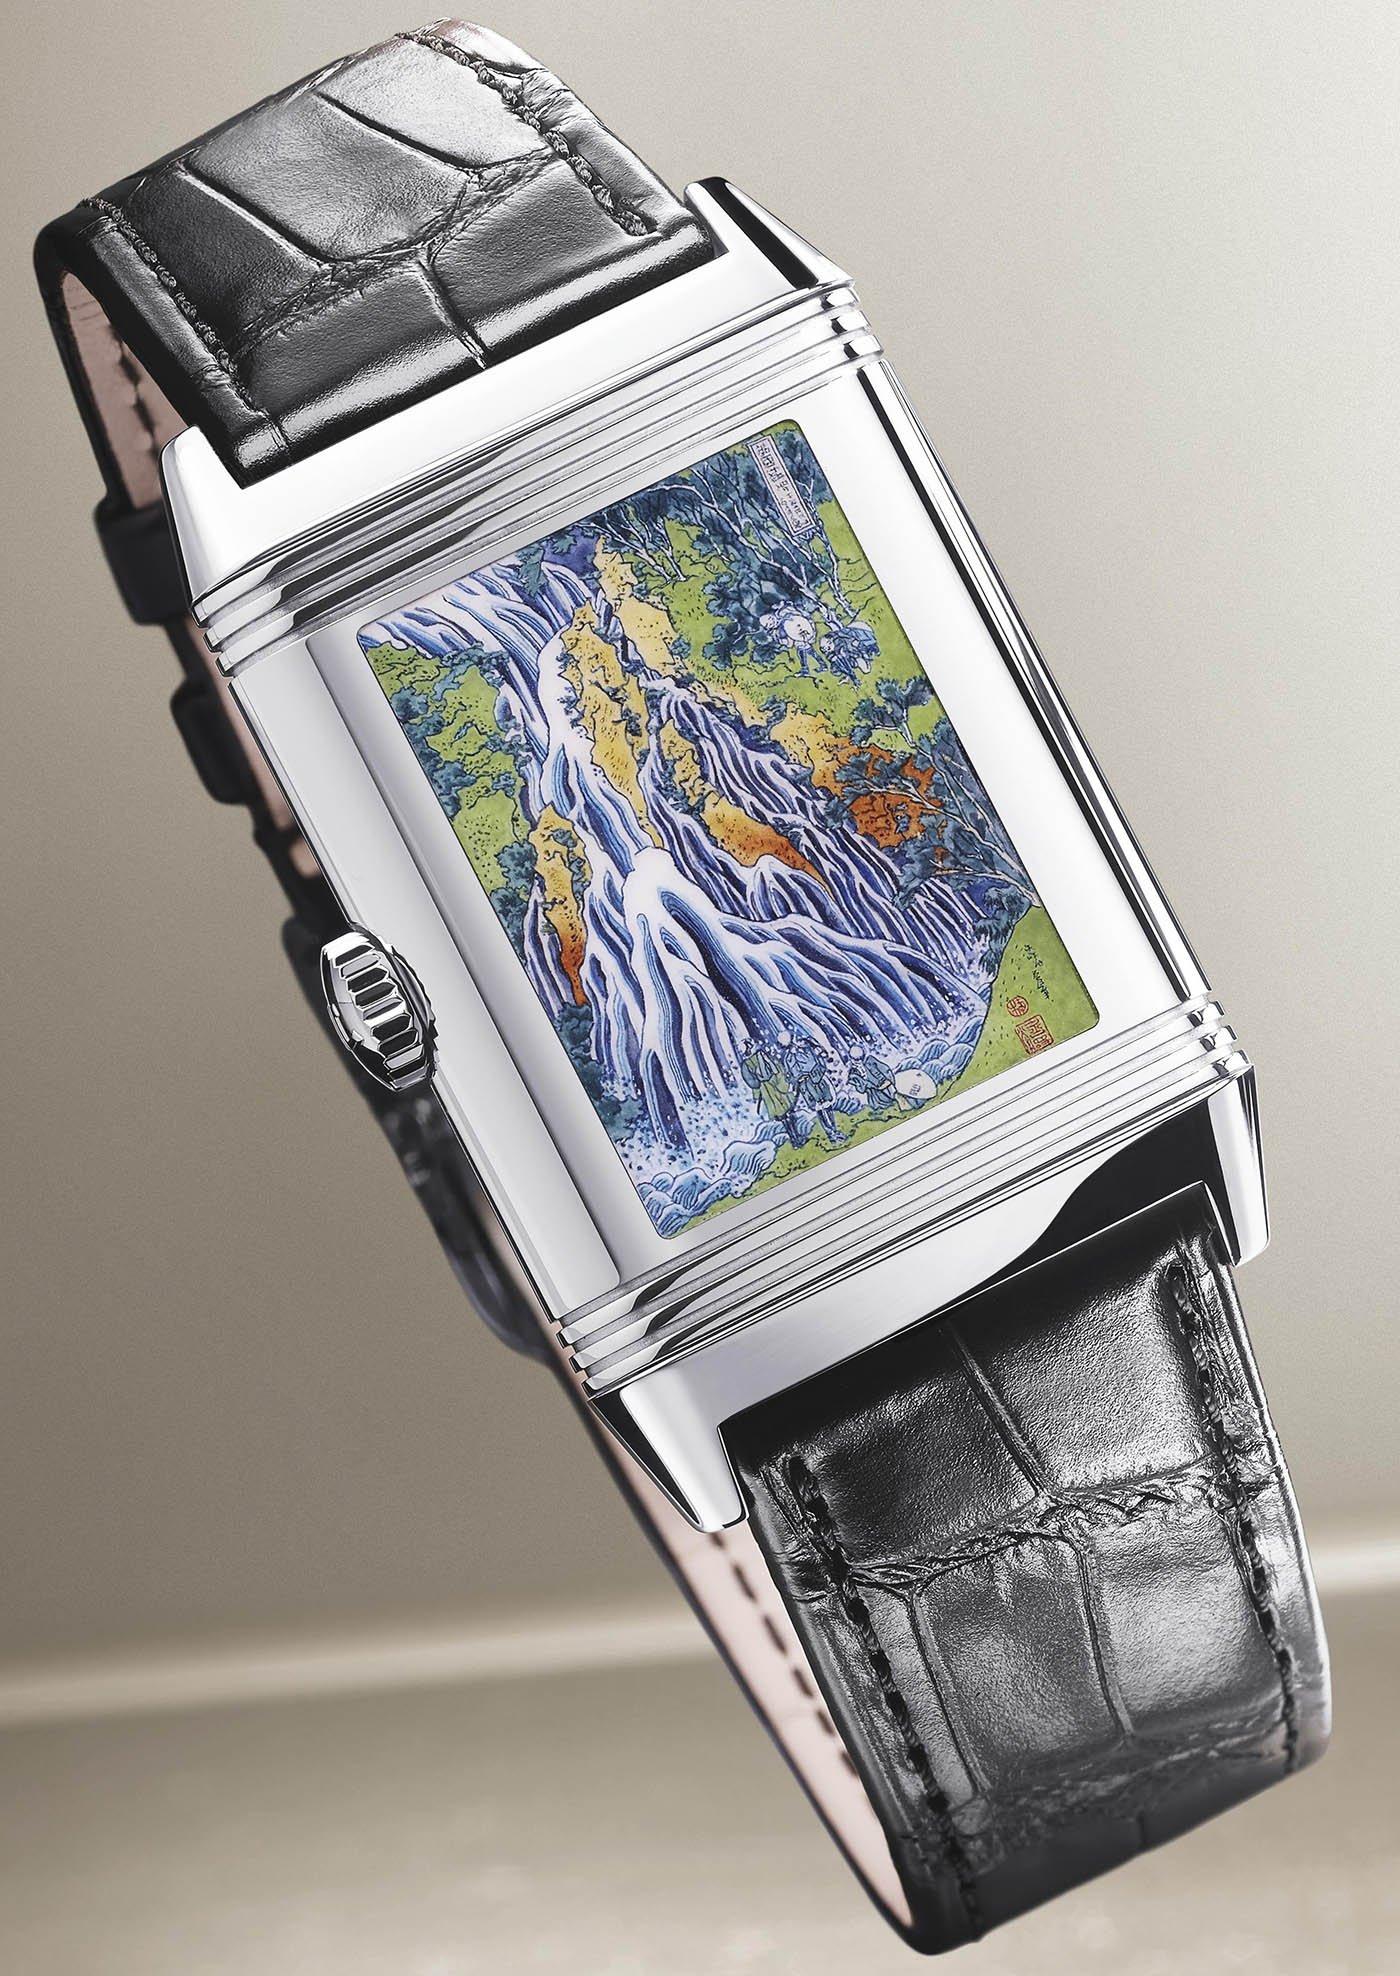 Jaeger-LeCoultre представляет лимитированную серию часов Reverso Tribute Enamel Hokusai 'Kirifuri Waterfall' Watch